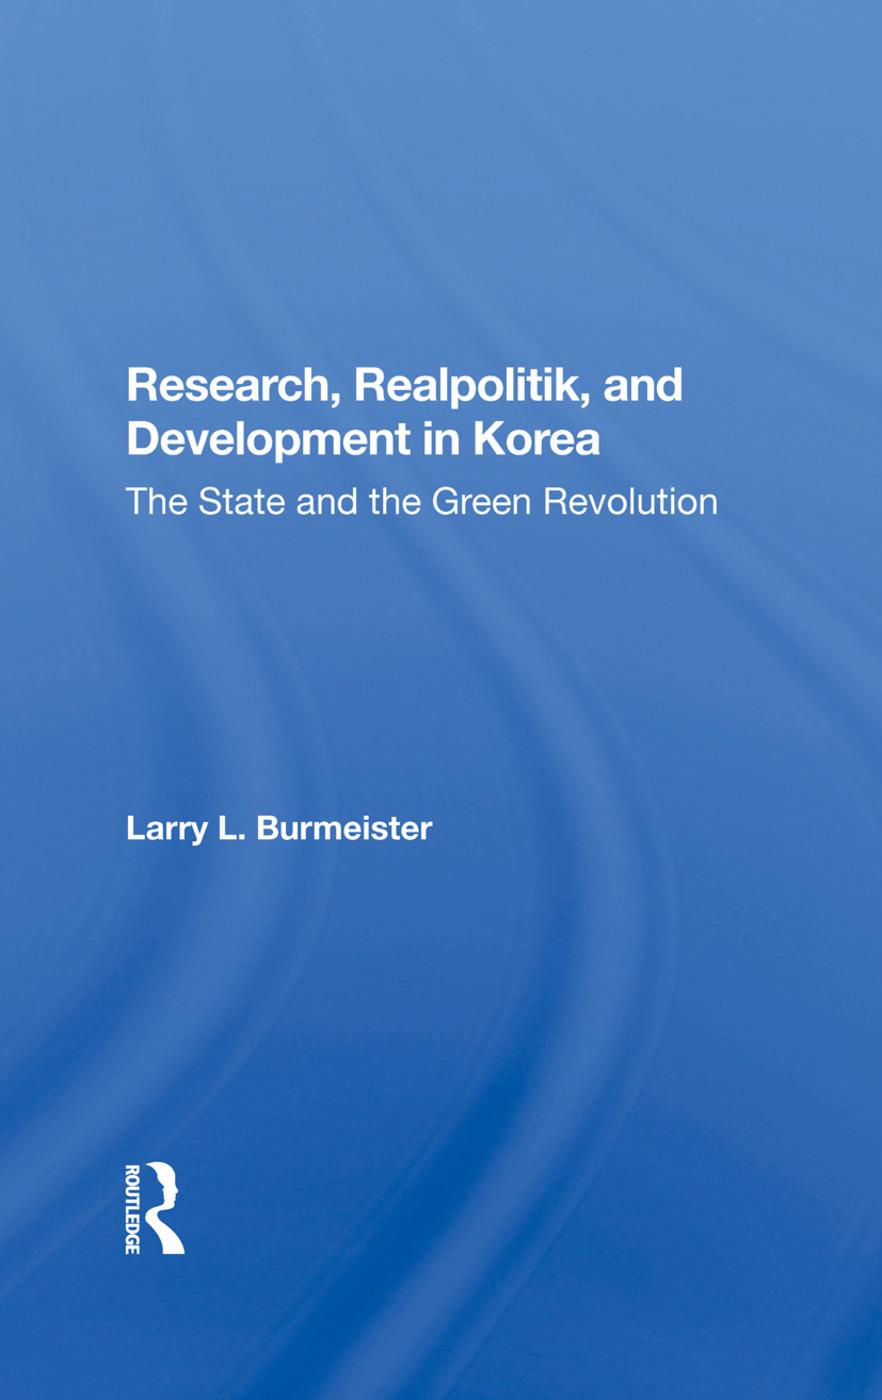 Research, Realpolitik, And Development In Korea